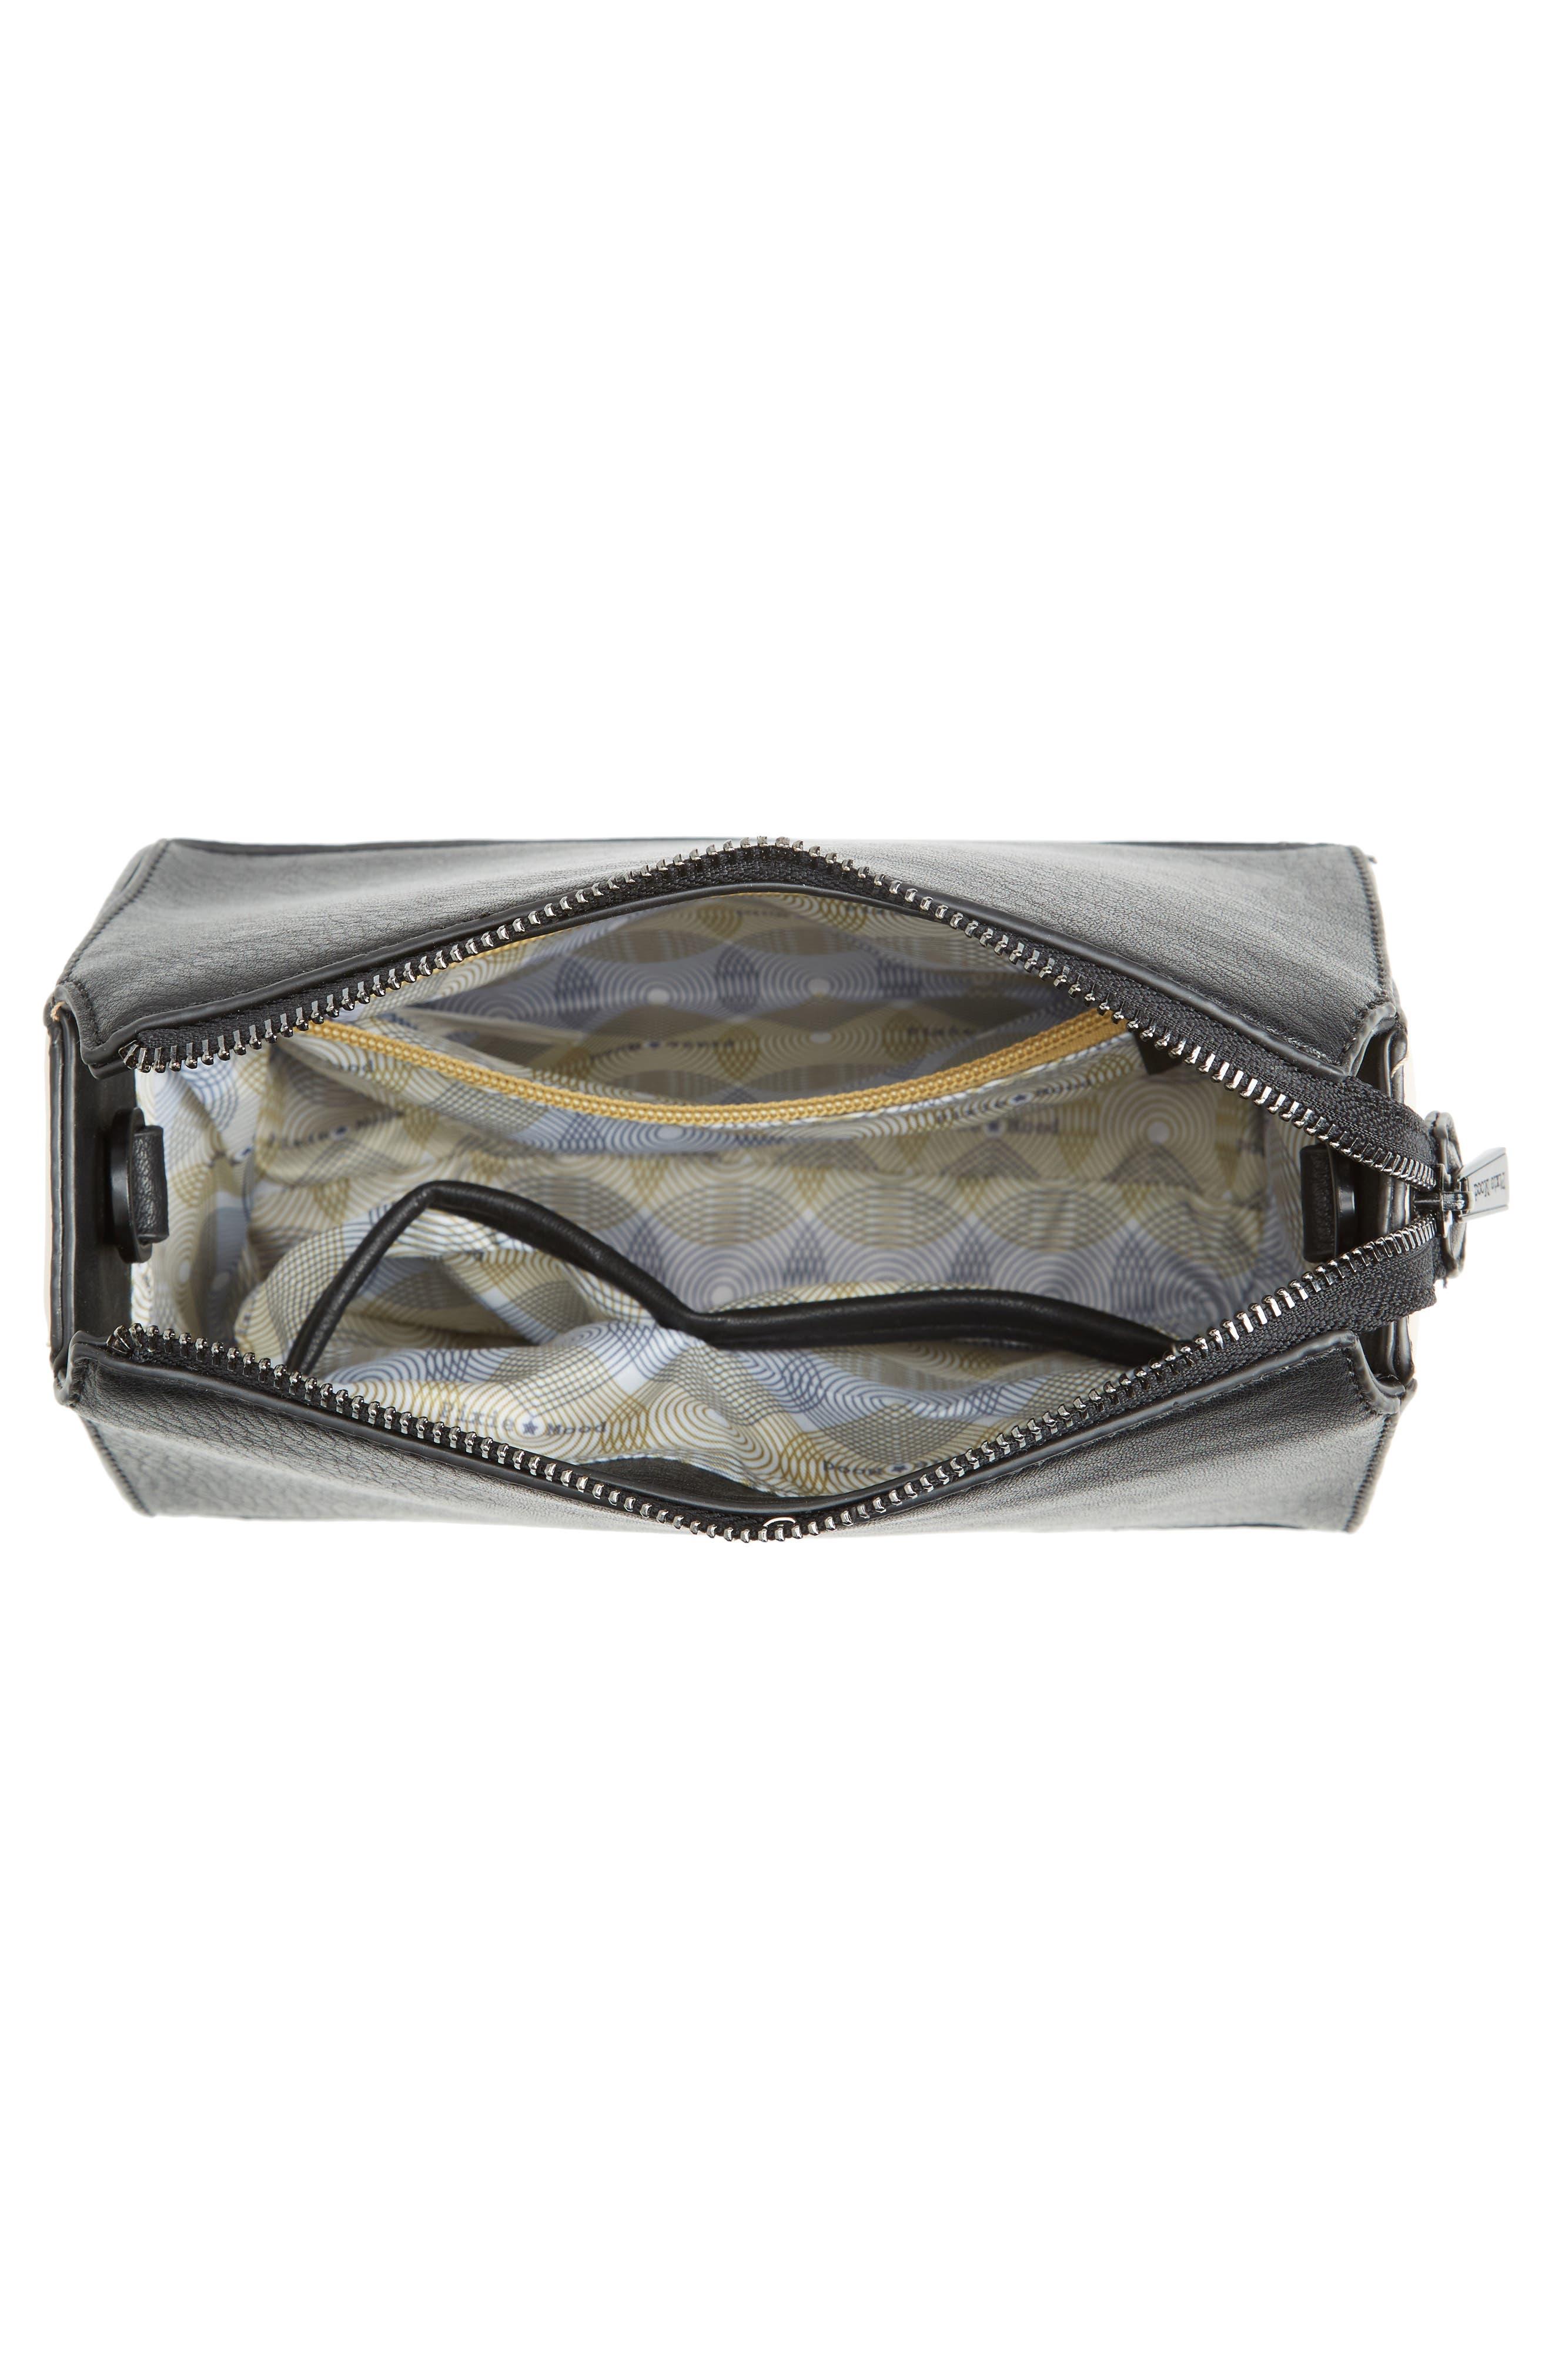 Faux Leather Crossbody Bag,                             Alternate thumbnail 4, color,                             001